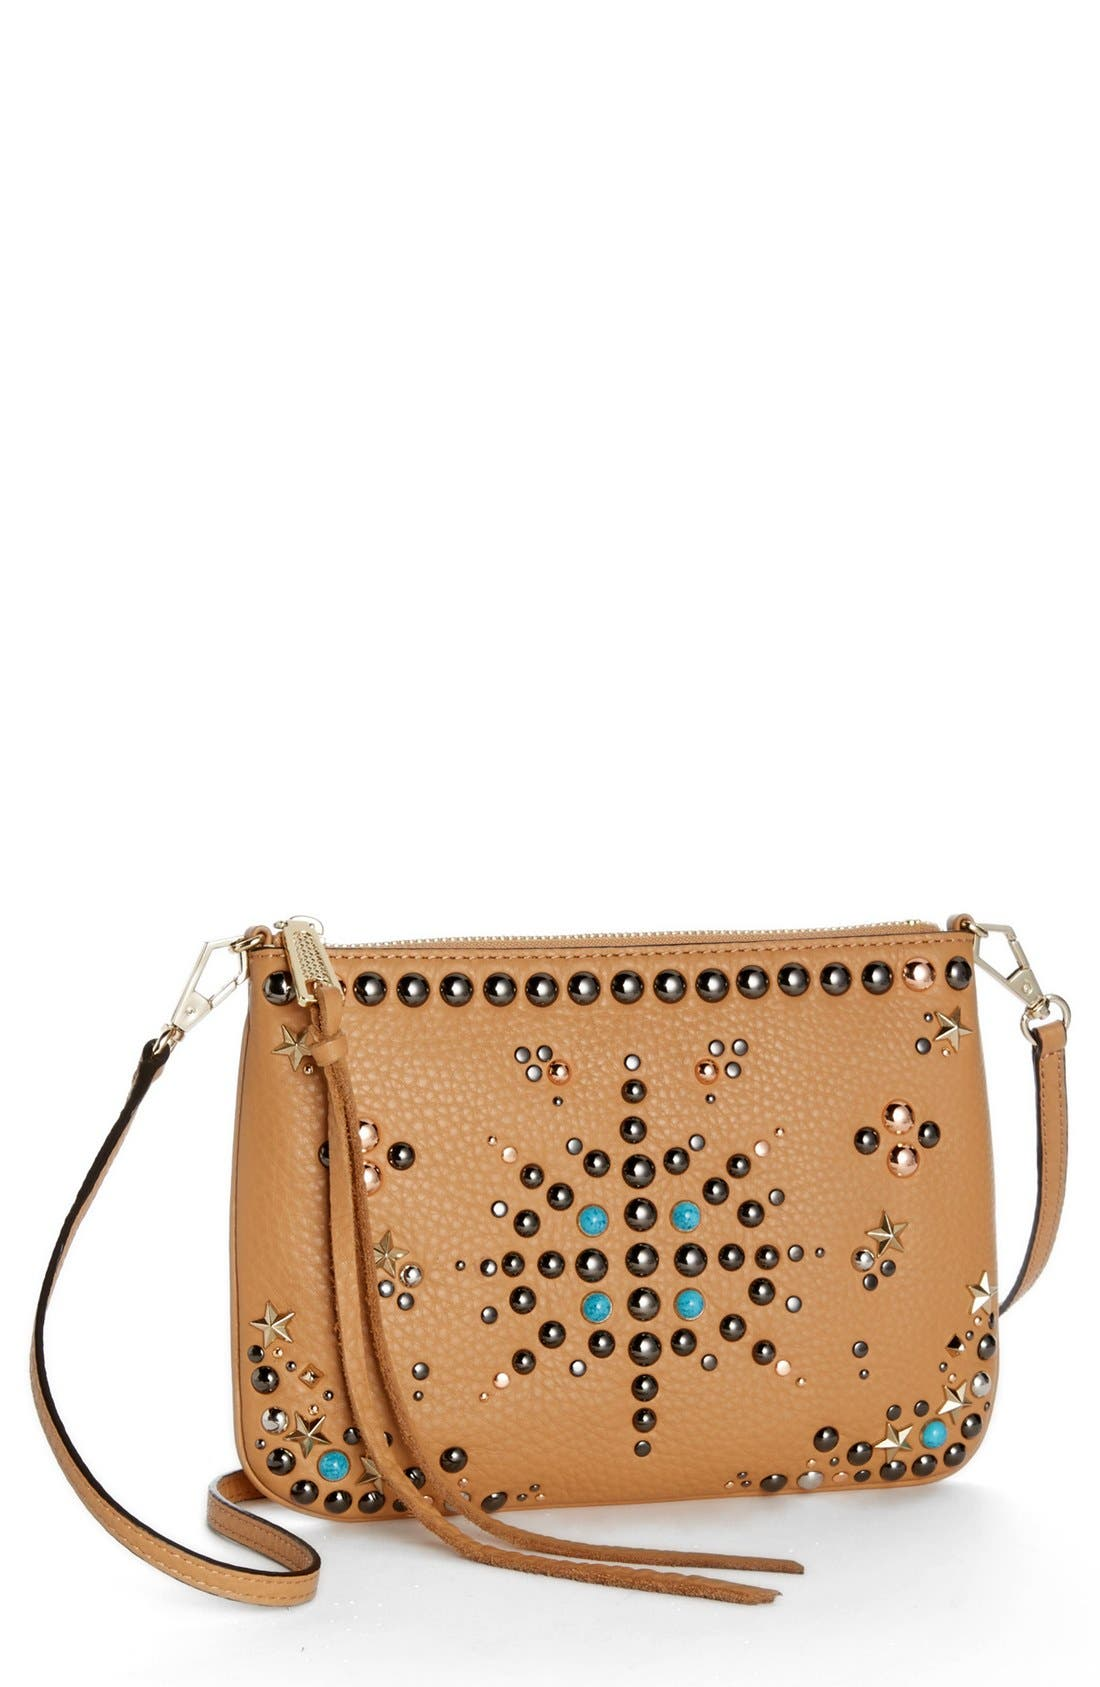 Main Image - Rebecca Minkoff 'Ascher' Crossbody Bag